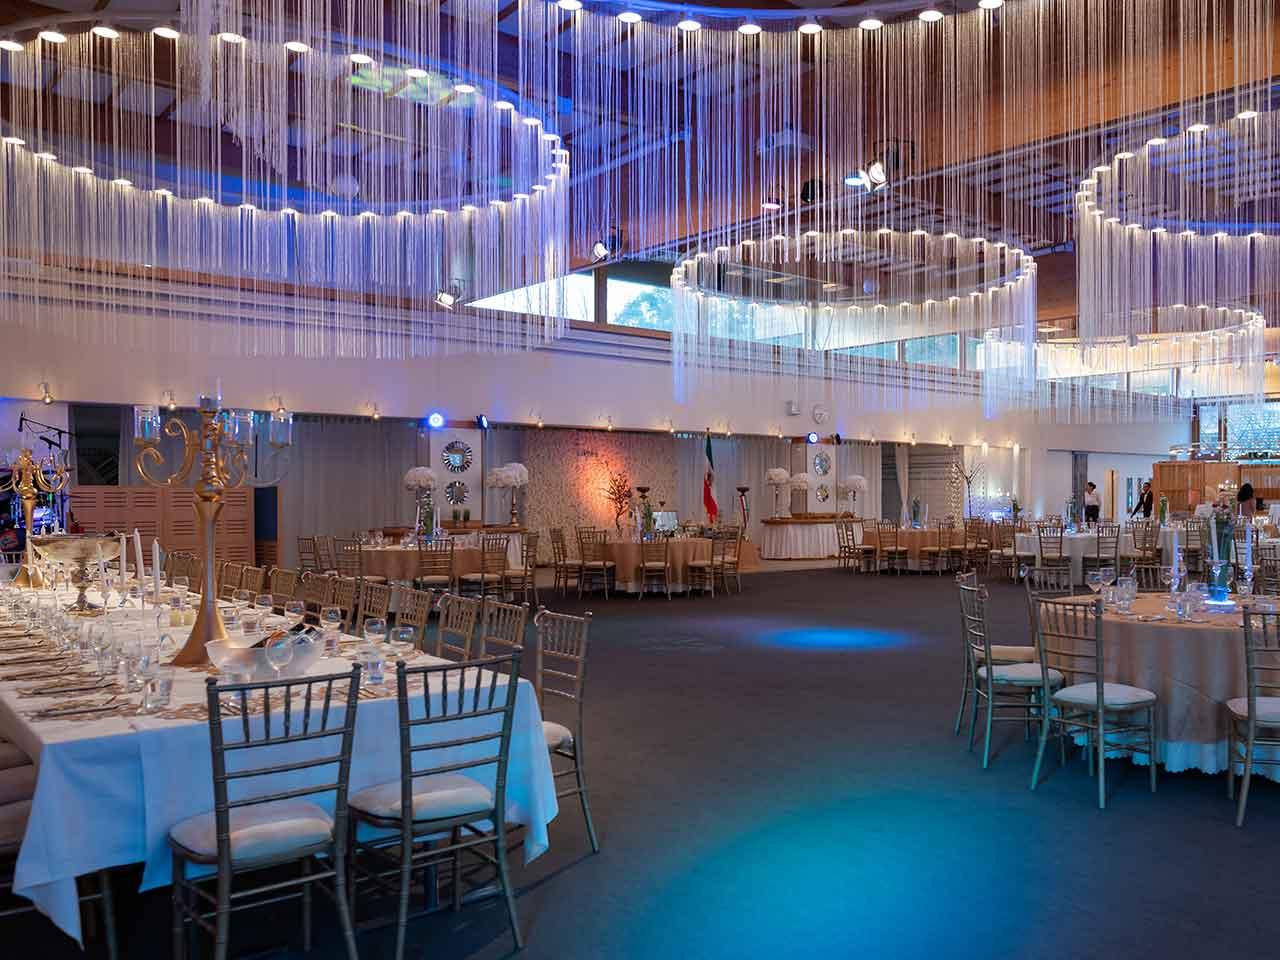 Kista Park eventlokal och festlokal